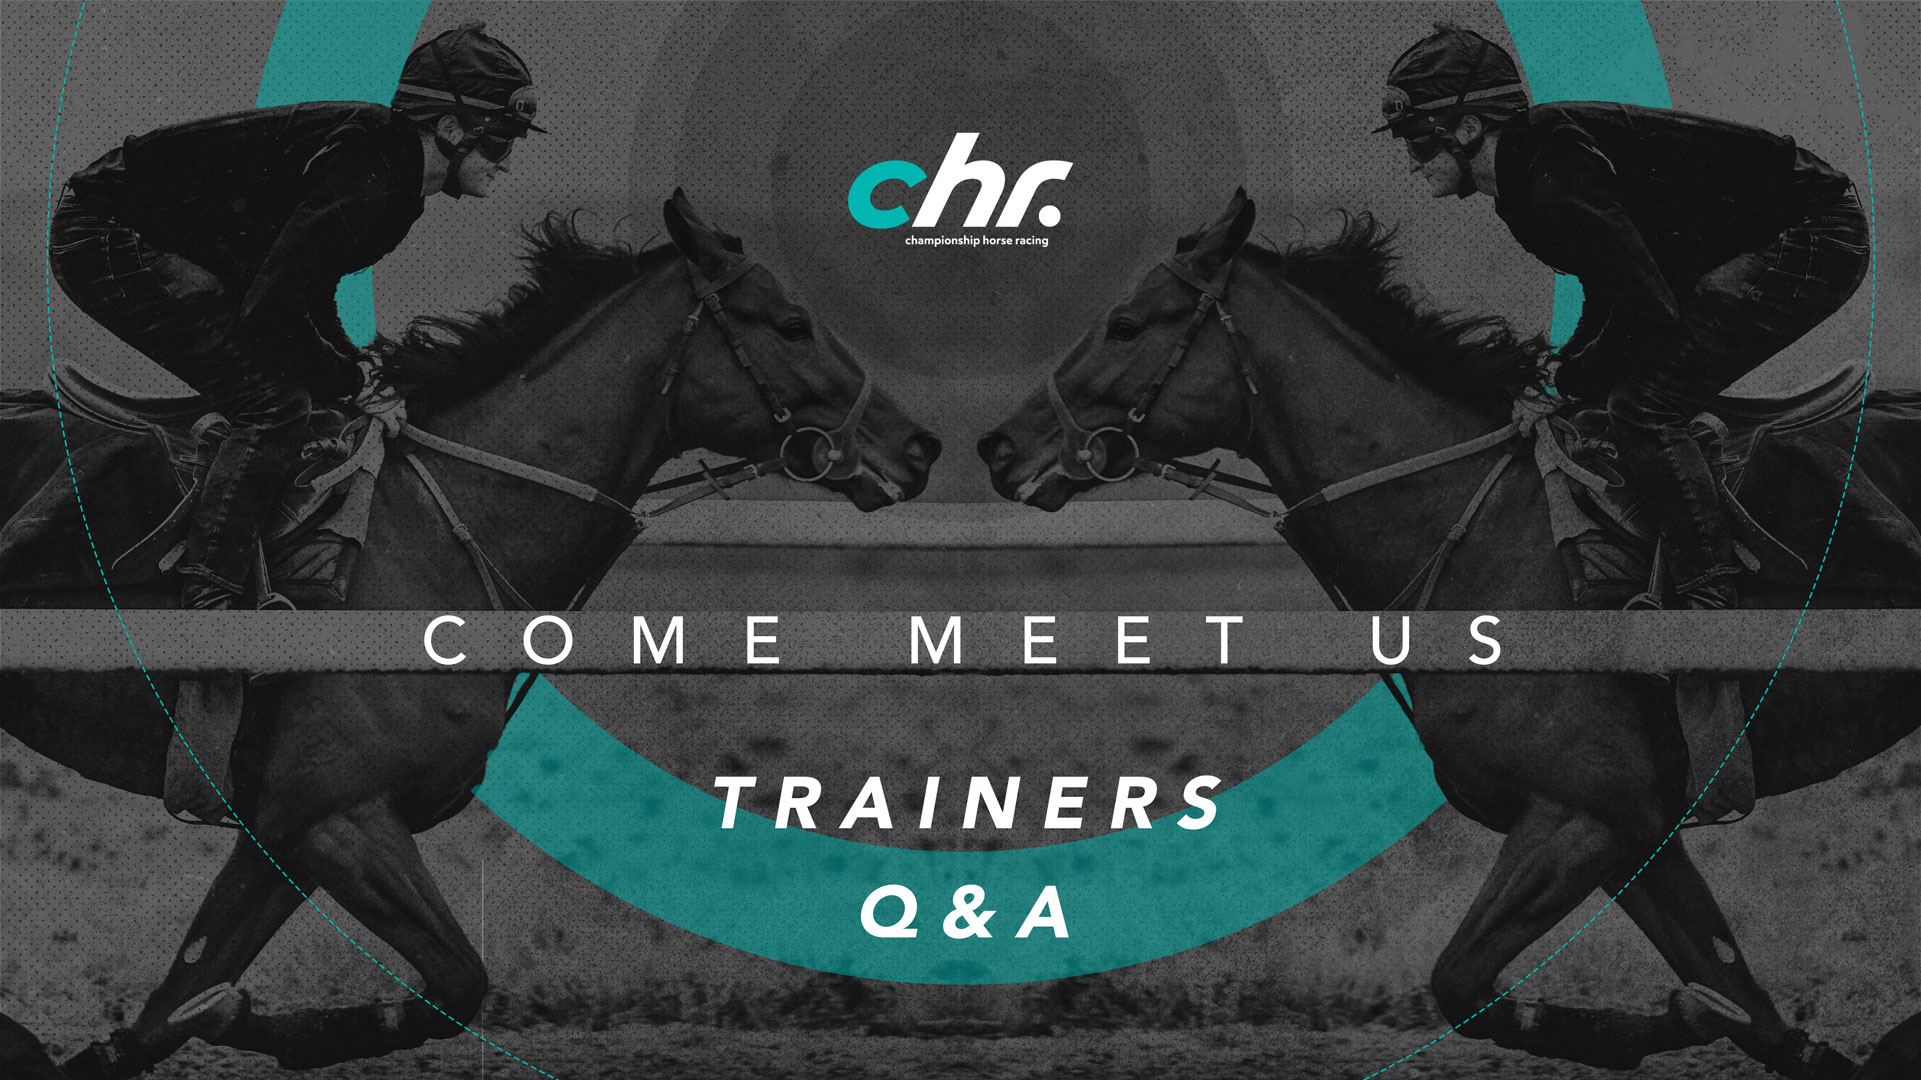 Trainers Q&A